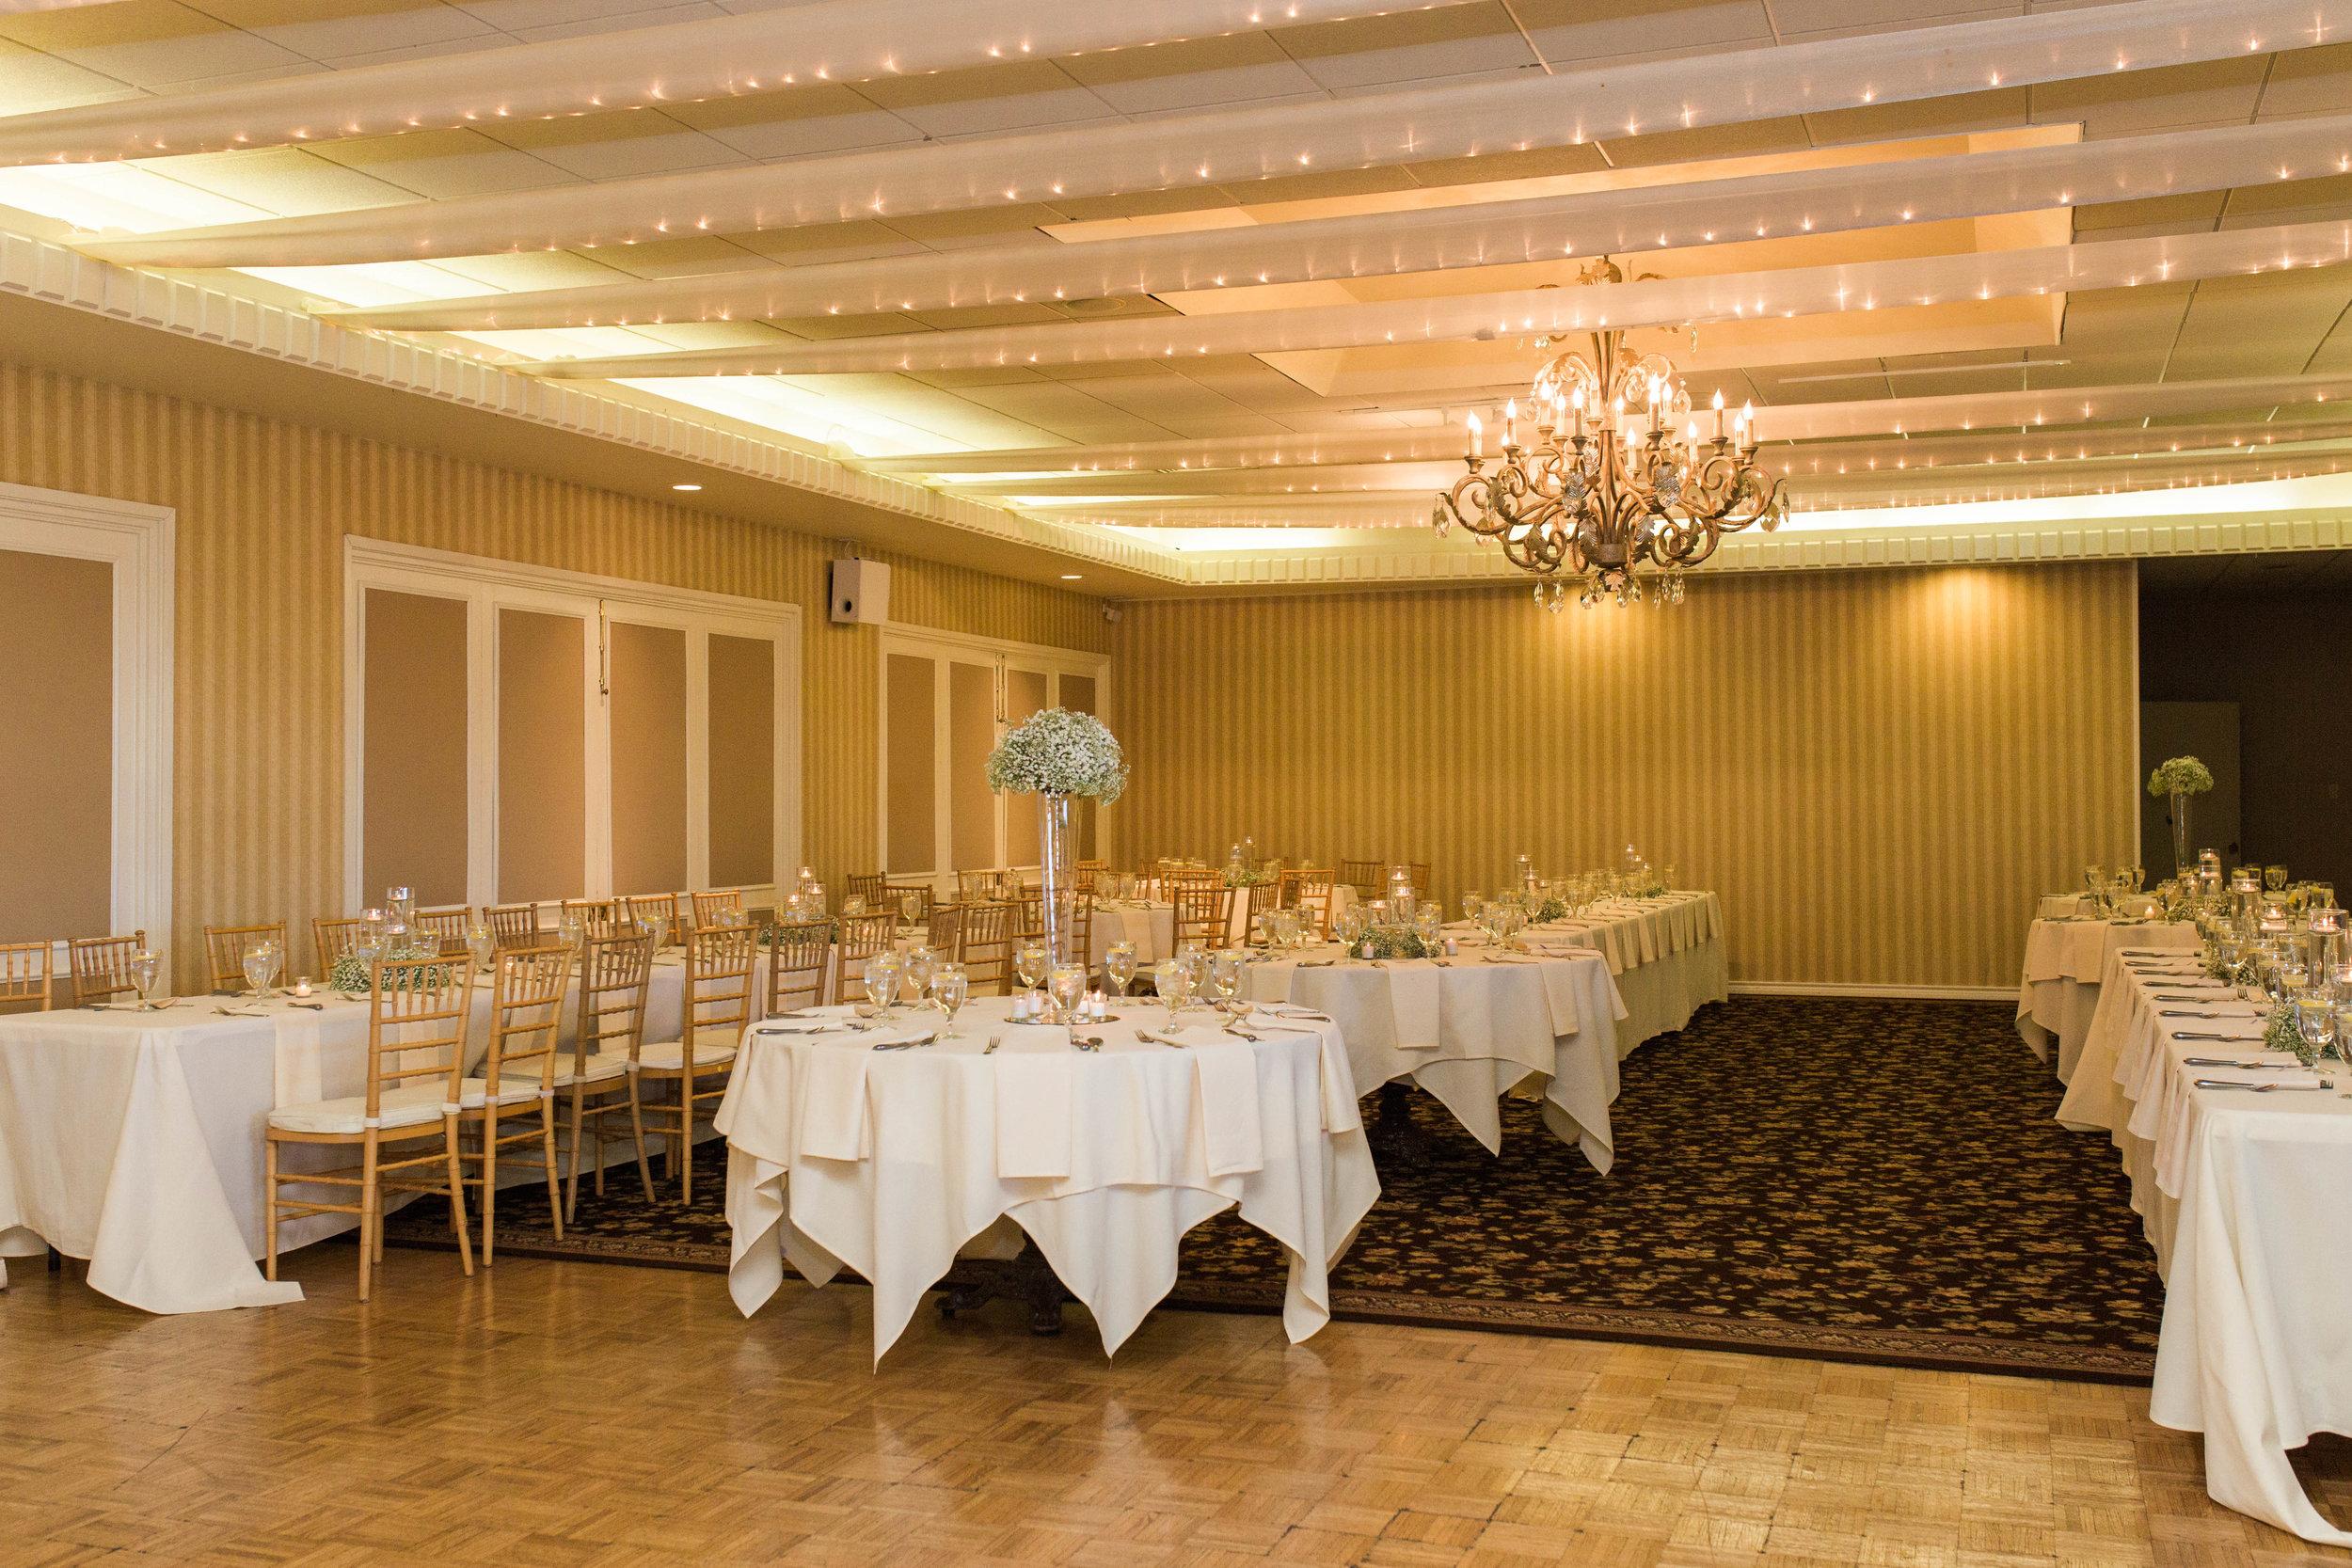 Beaumont Texas Country Club wedding-5645.jpg